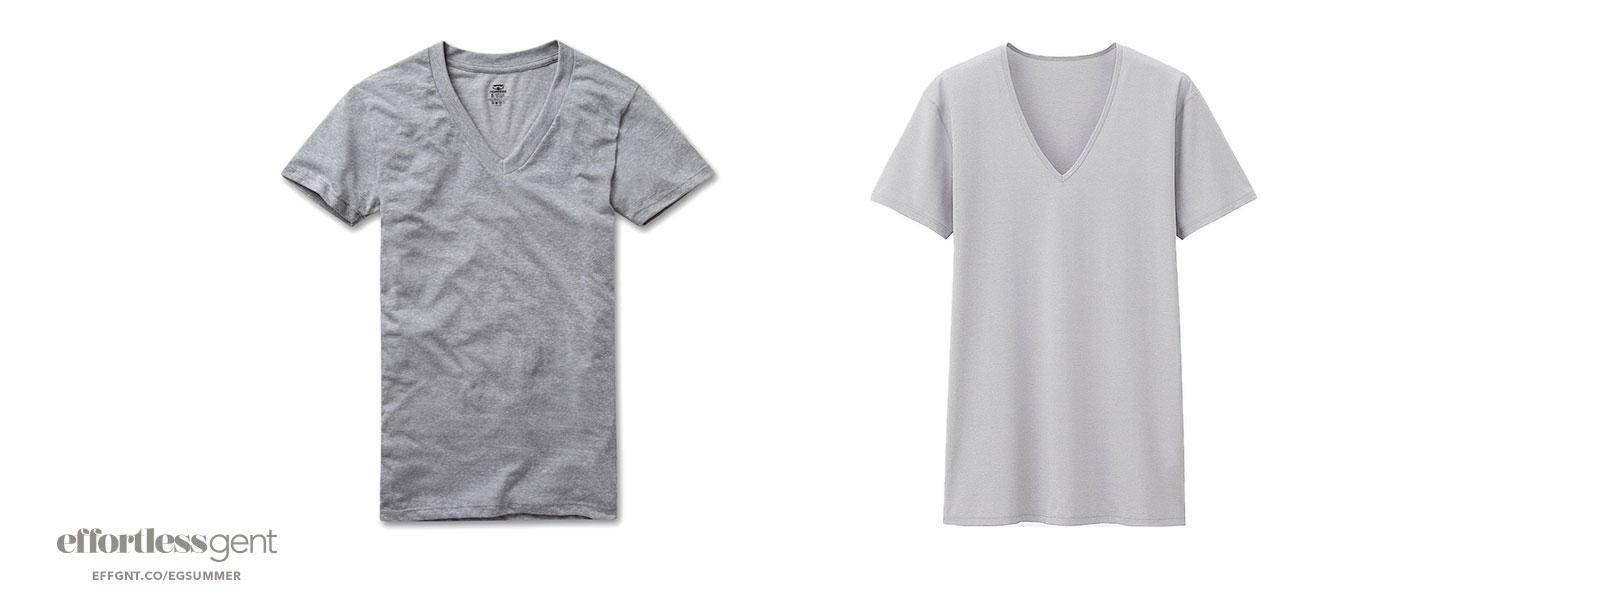 undershirts - summer clothes for men - effortless gent